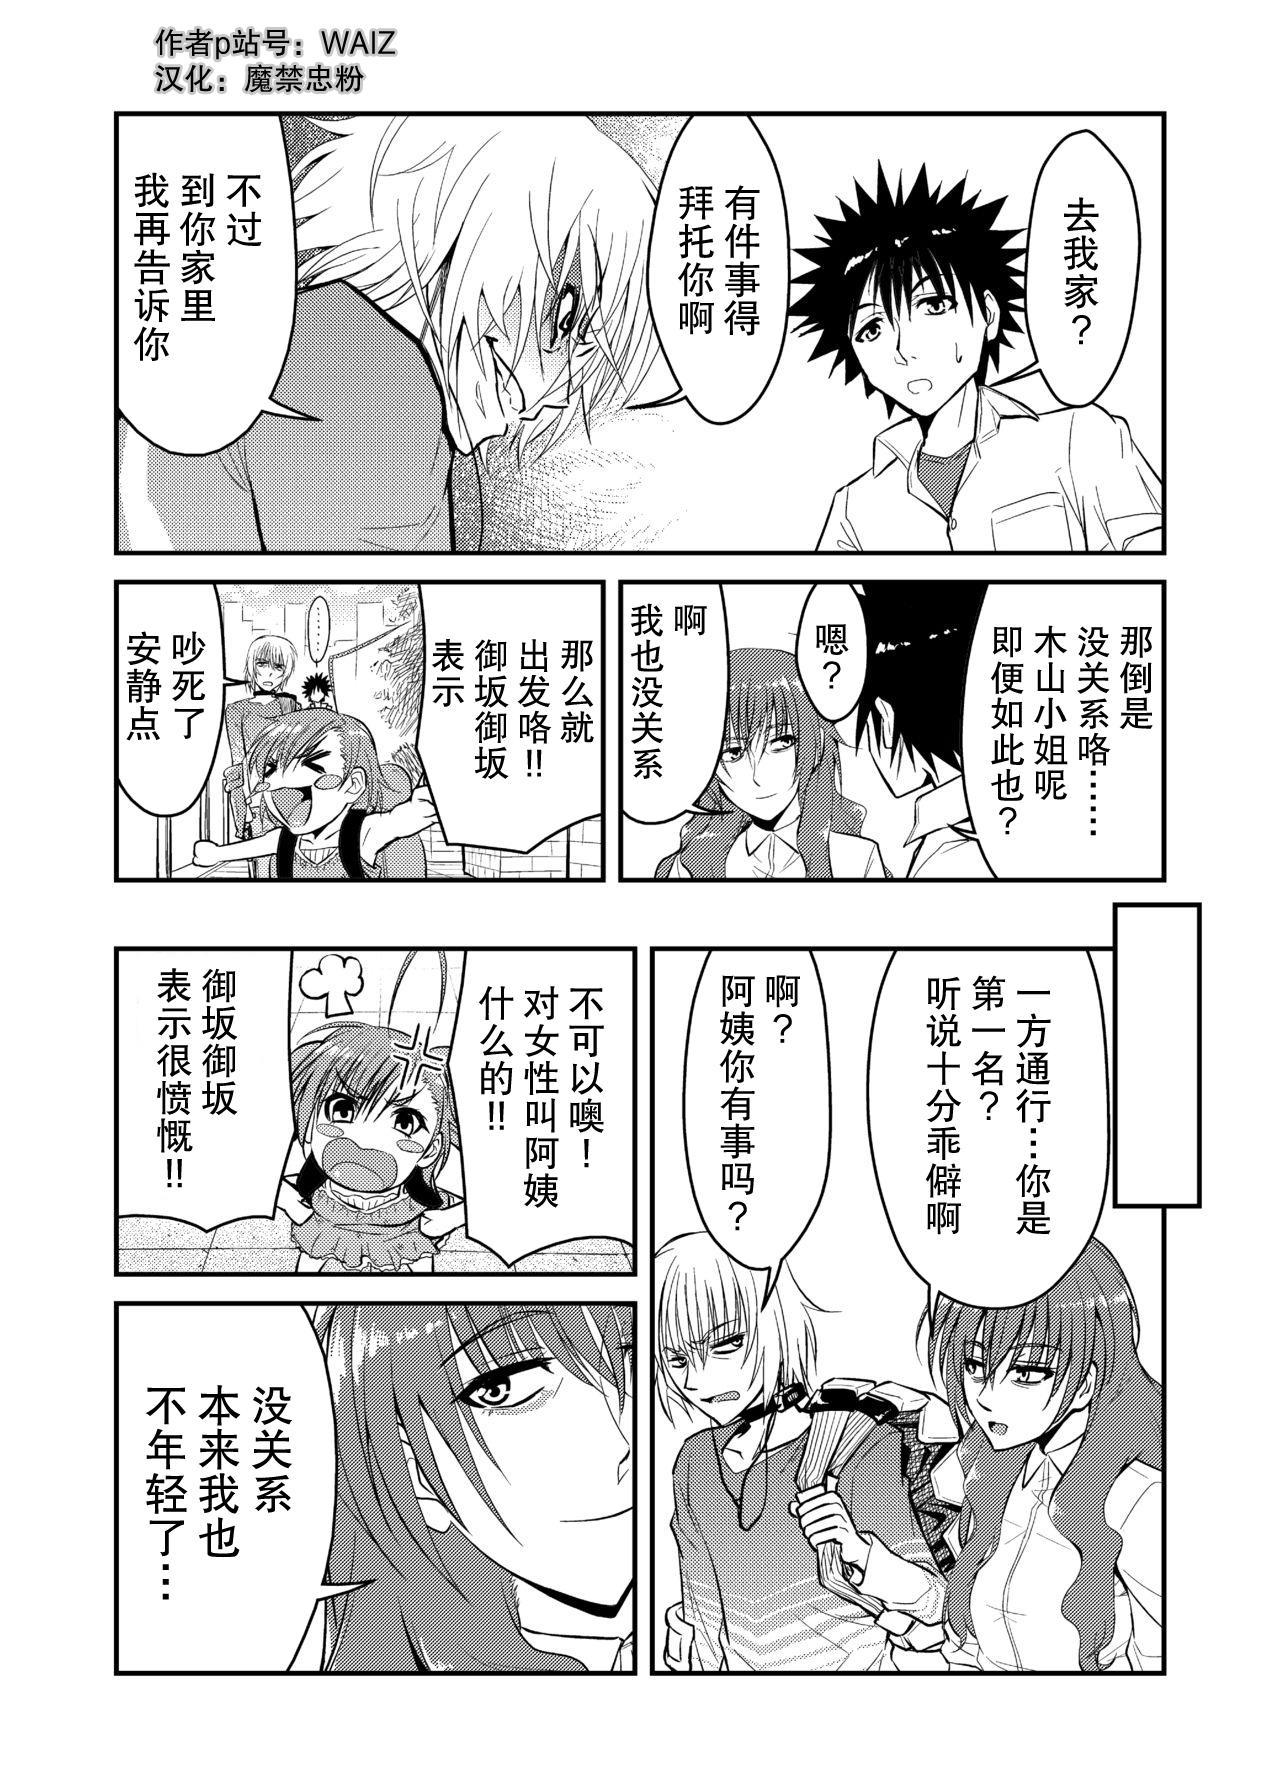 [WAIZ][同人个人渣汉化][就算是上条先生我家要住7个人还是太勉强了](Toaru Majutsu no Index) [中国翻译] 20